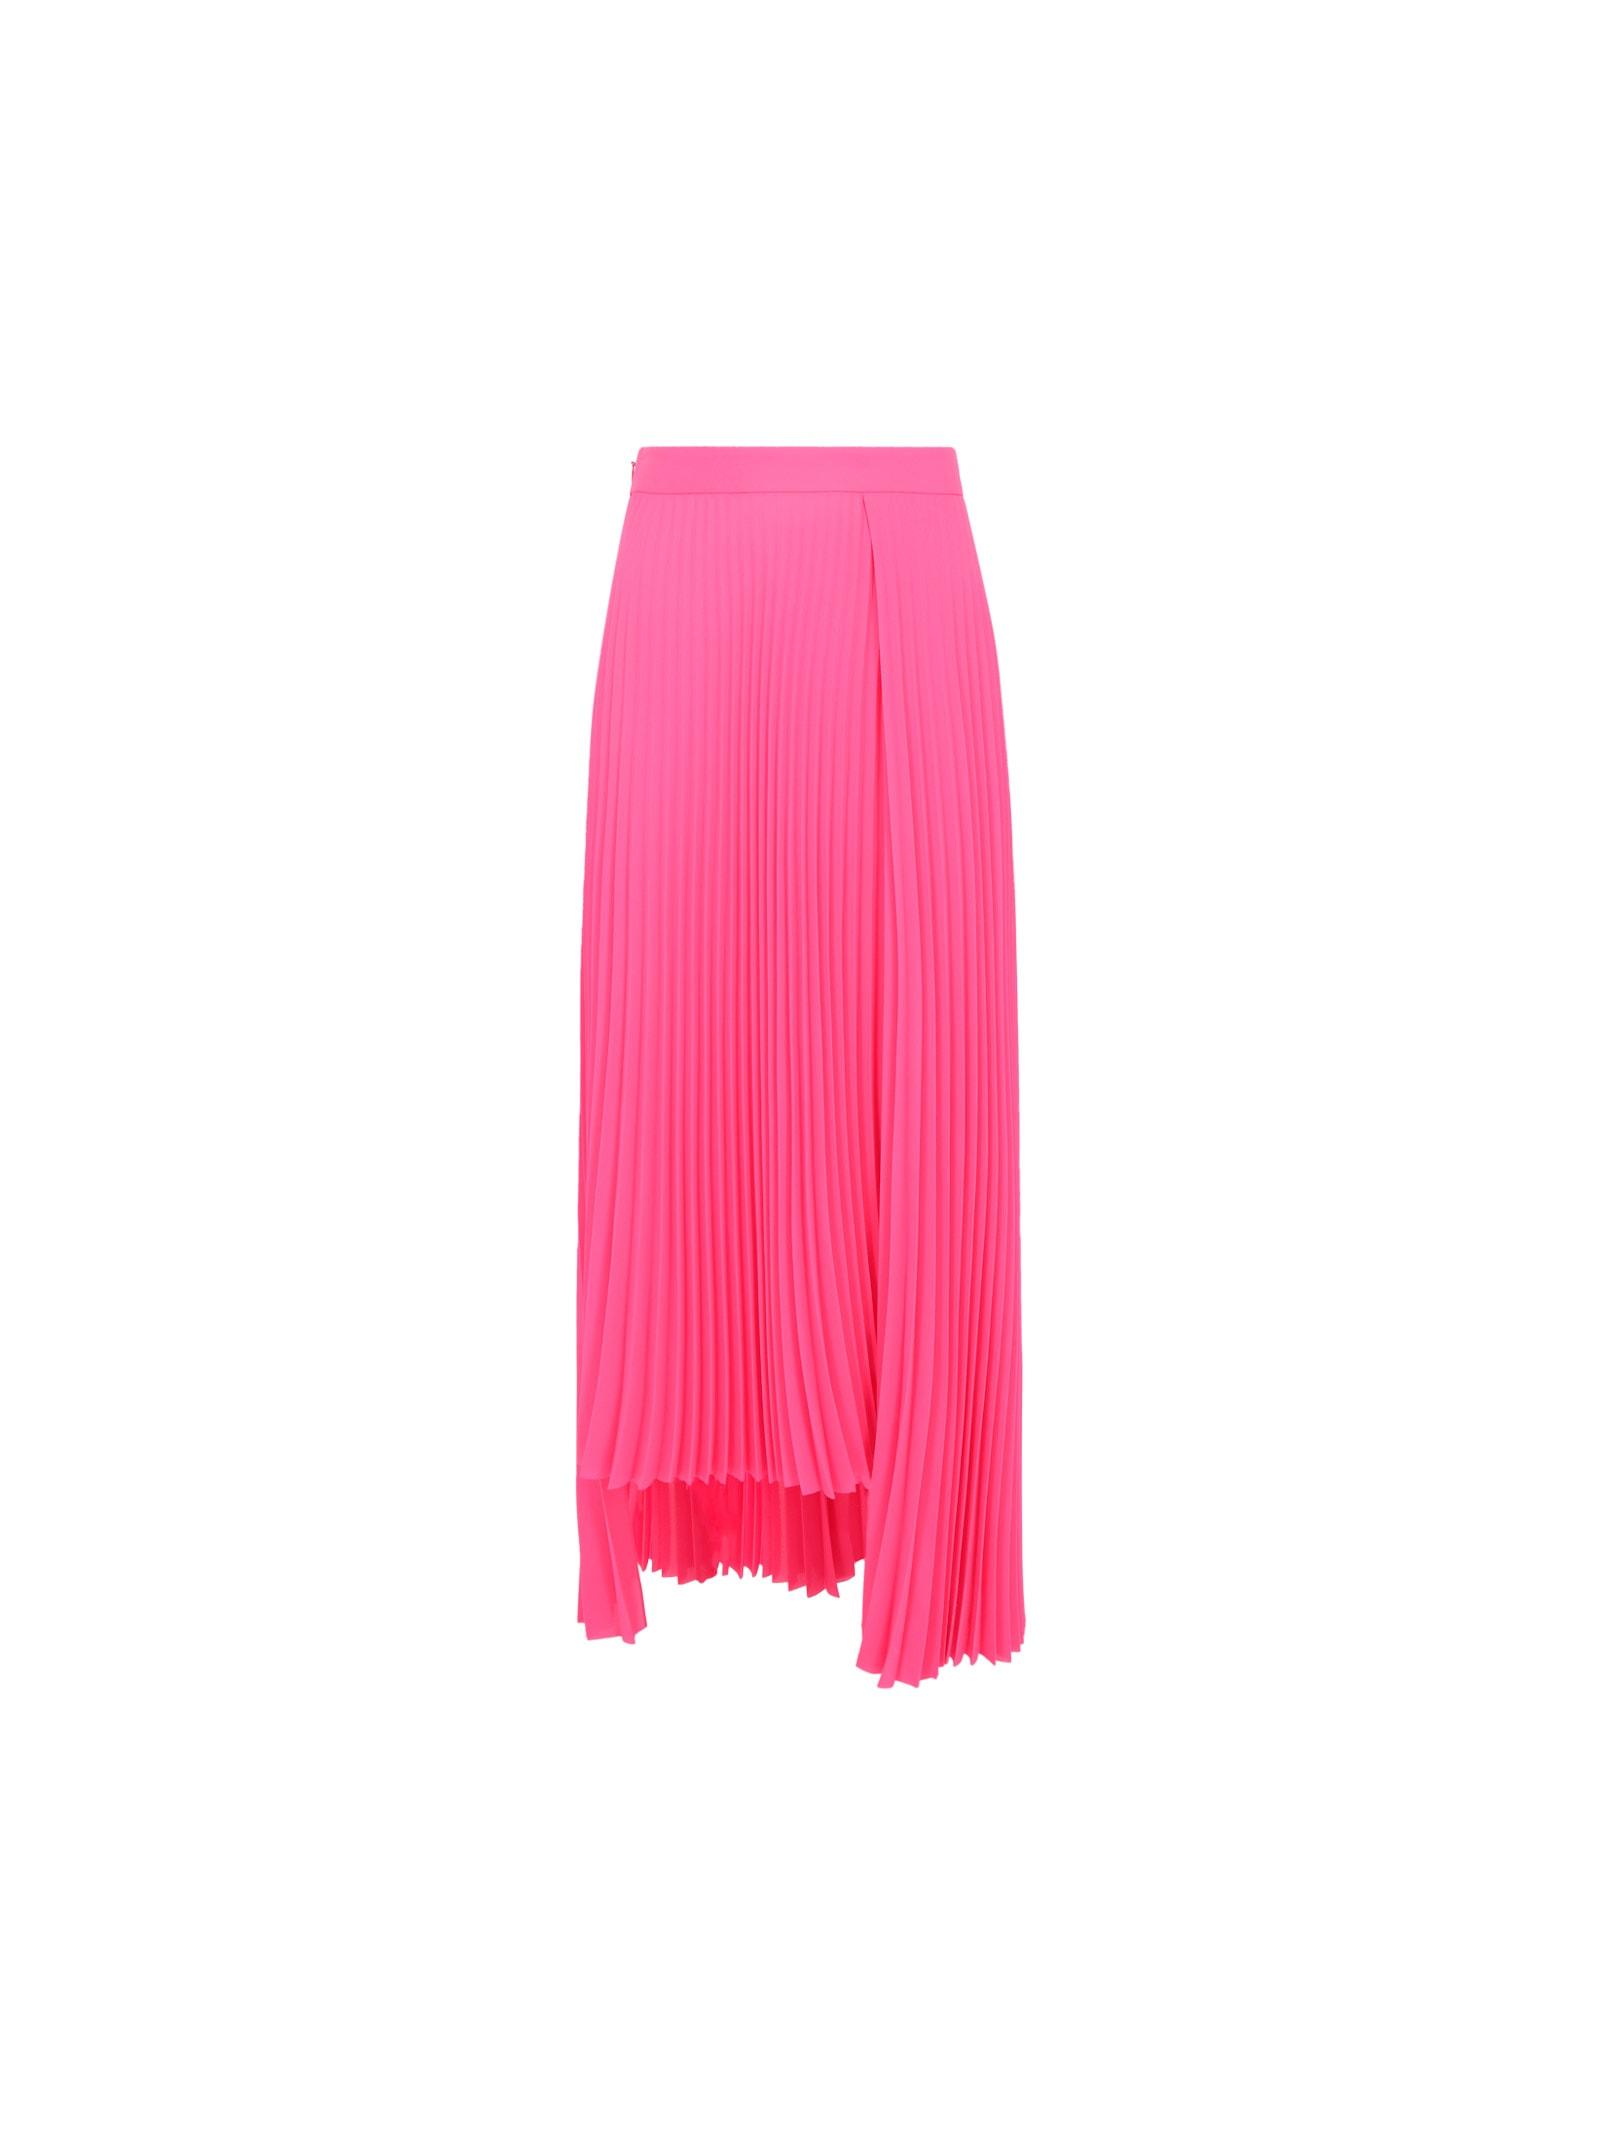 Balenciaga Skirts SKIRT